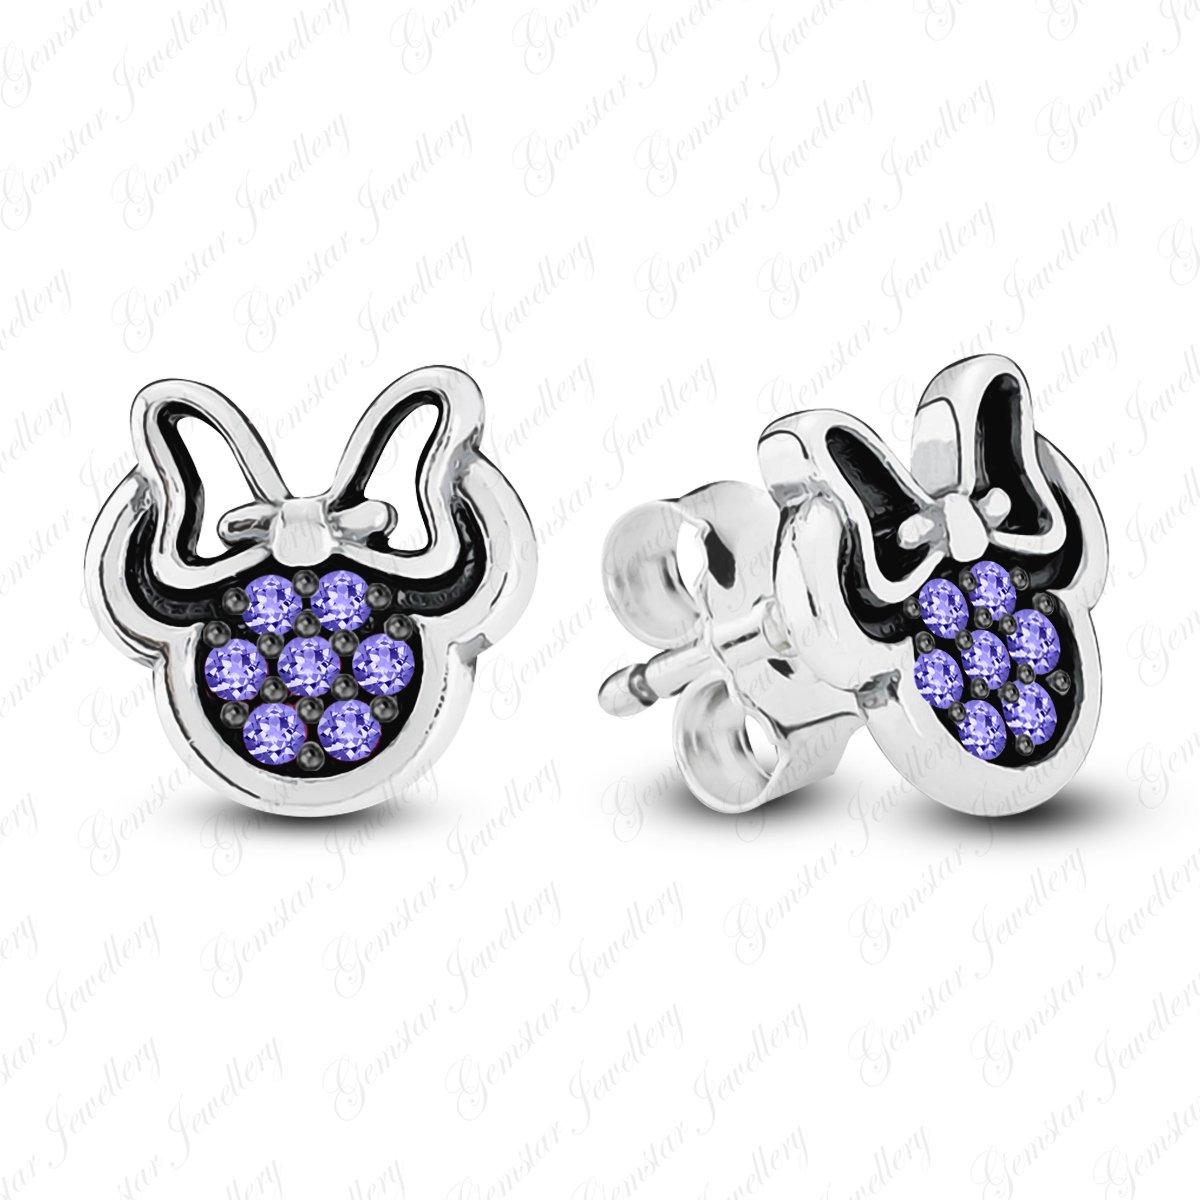 Gemstar Jewellery 18K White /& Black Gold Finish Round Shape Purple Tanzanite Minnie Mouse Earrings